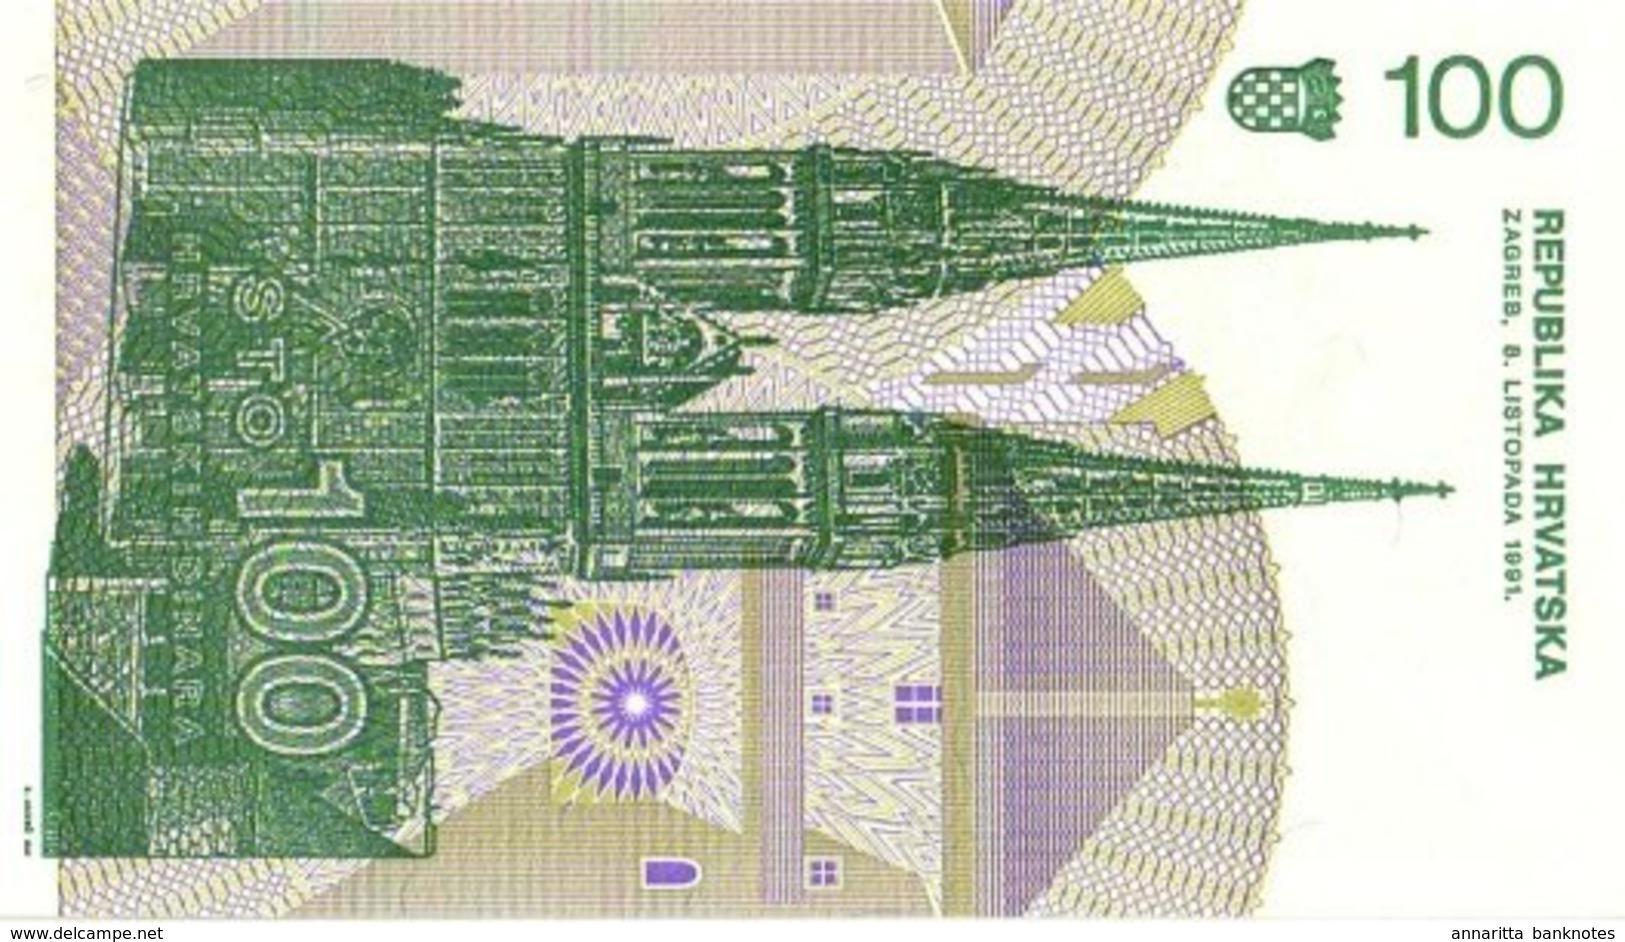 CROATIA 100 DINARS 1991 UNC [ HR305a ] - Croatia